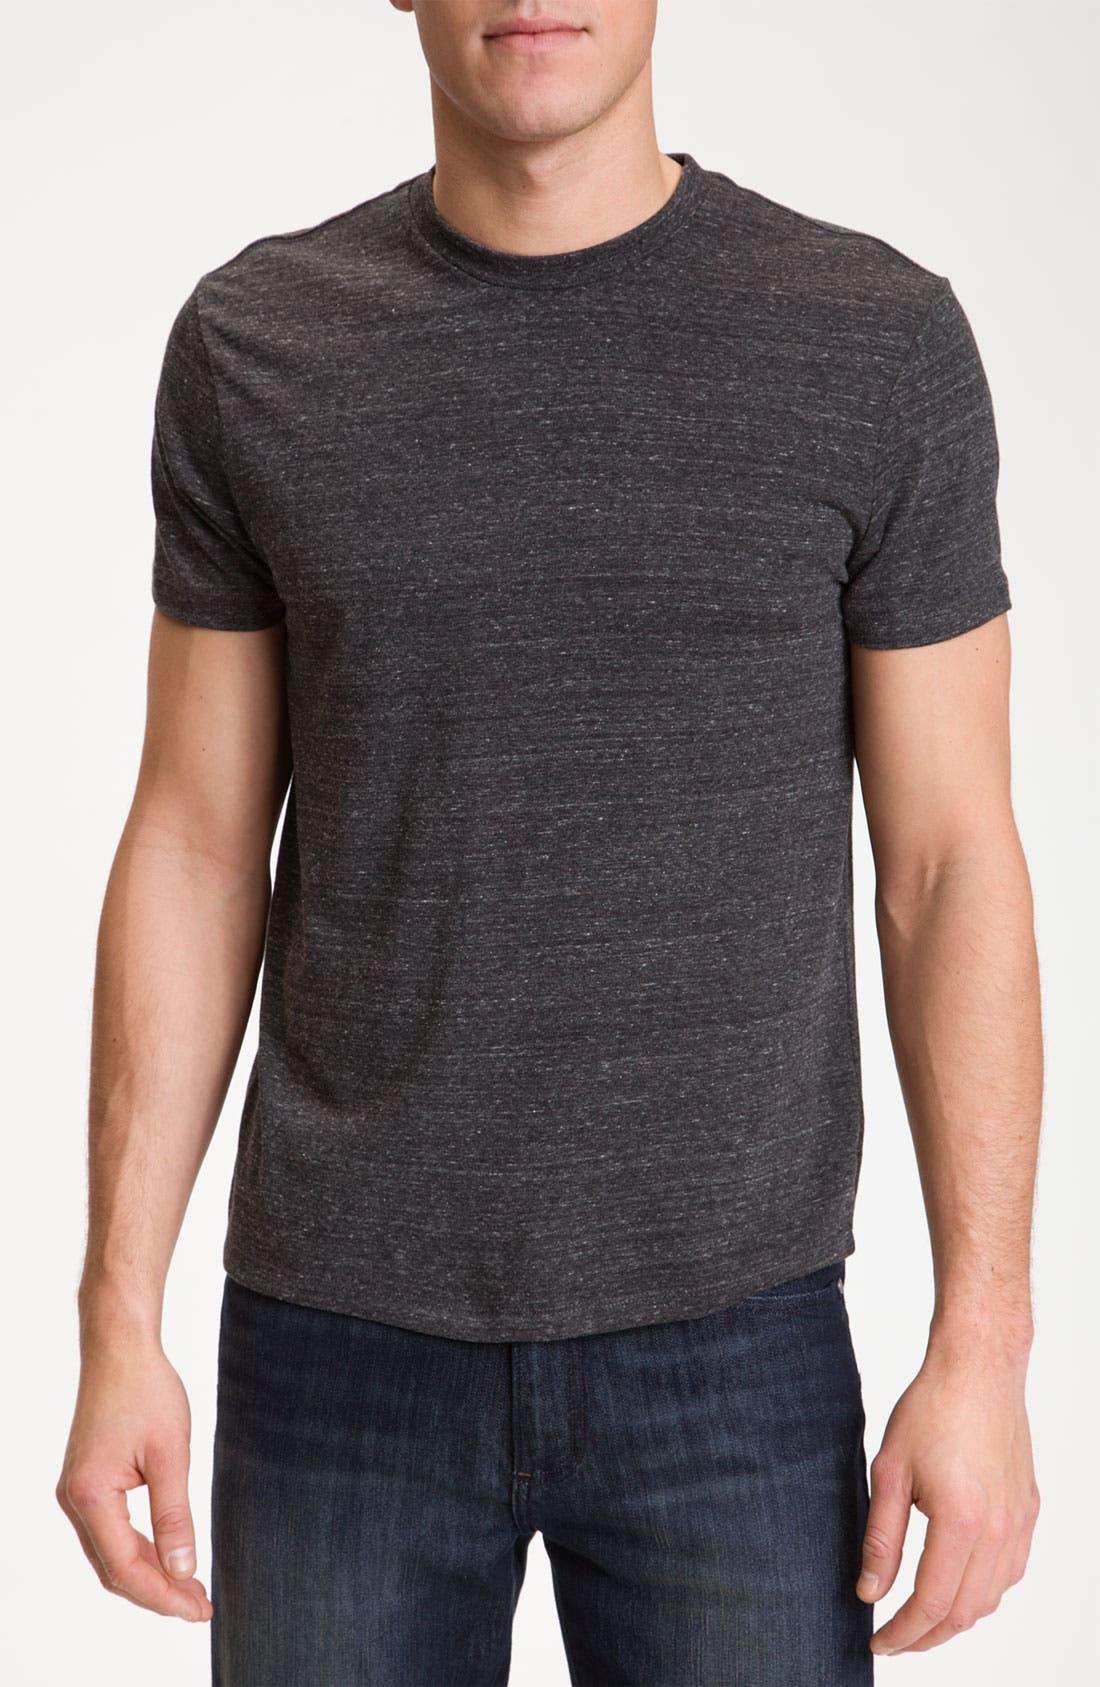 Alternate Image 1 Selected - The Rail Slim Fit Crewneck T-Shirt (2 for $30)